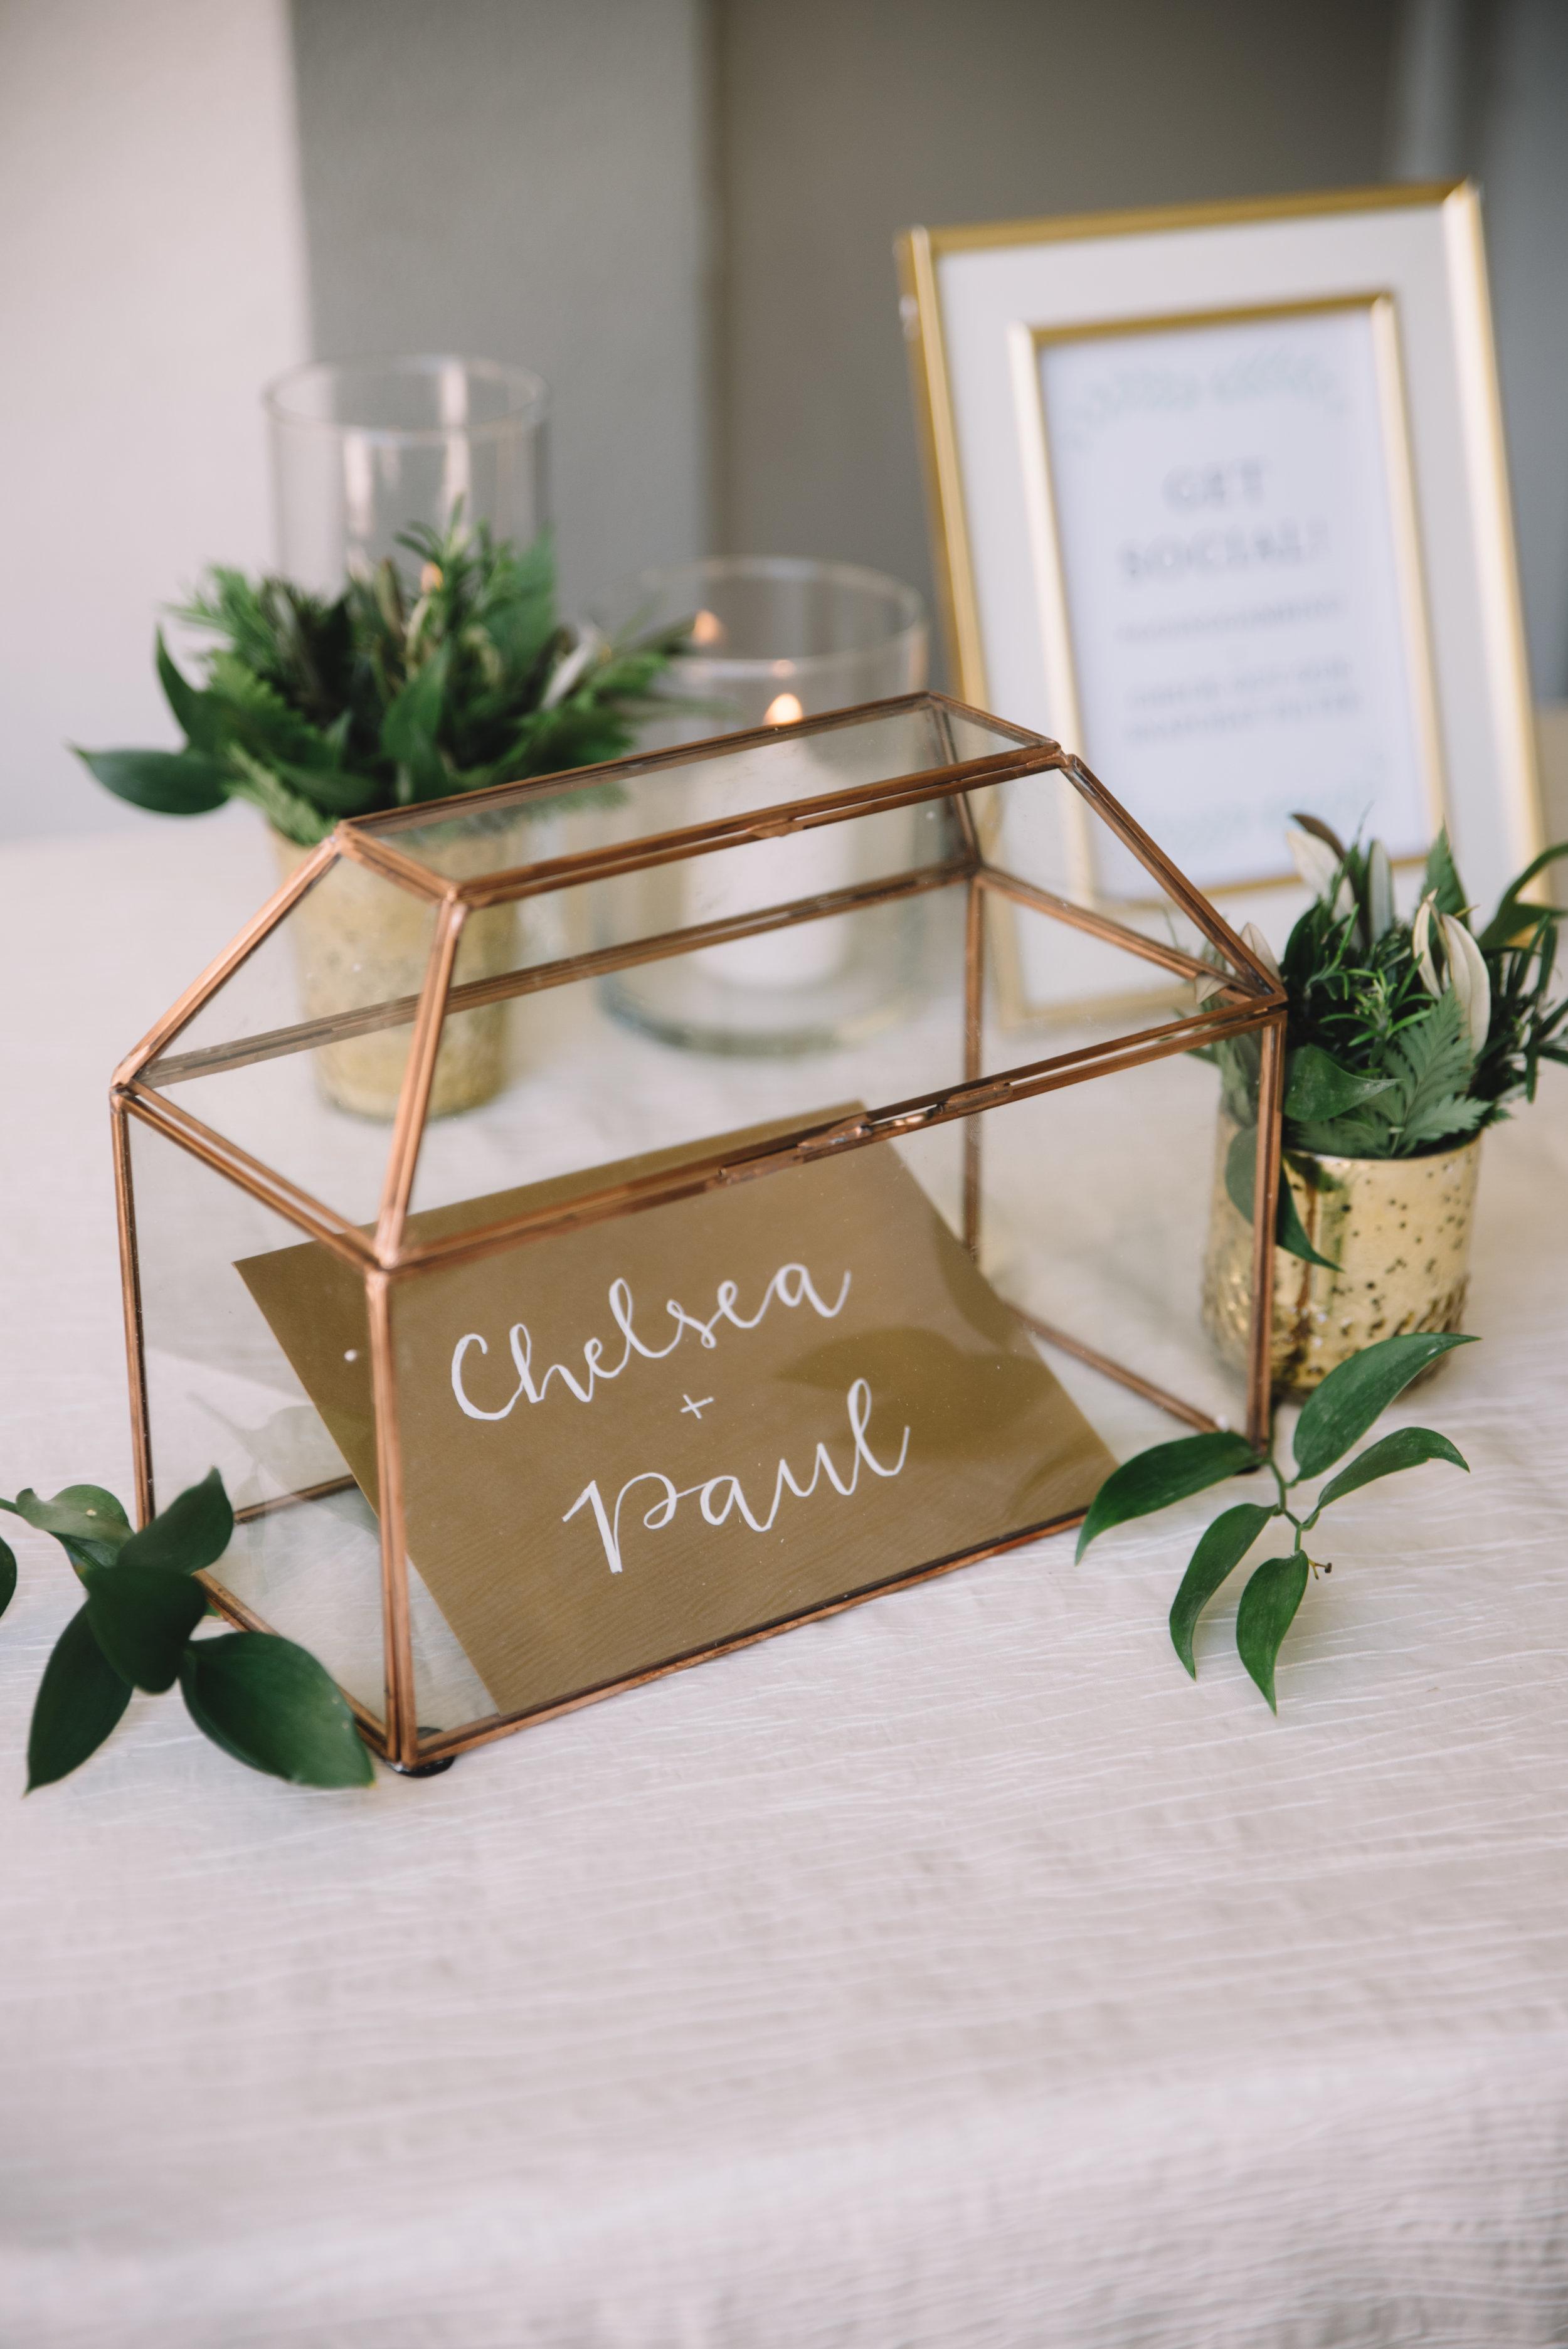 160_7018_ChelseaAndPaul_WeddingFavOfJennings.jpg